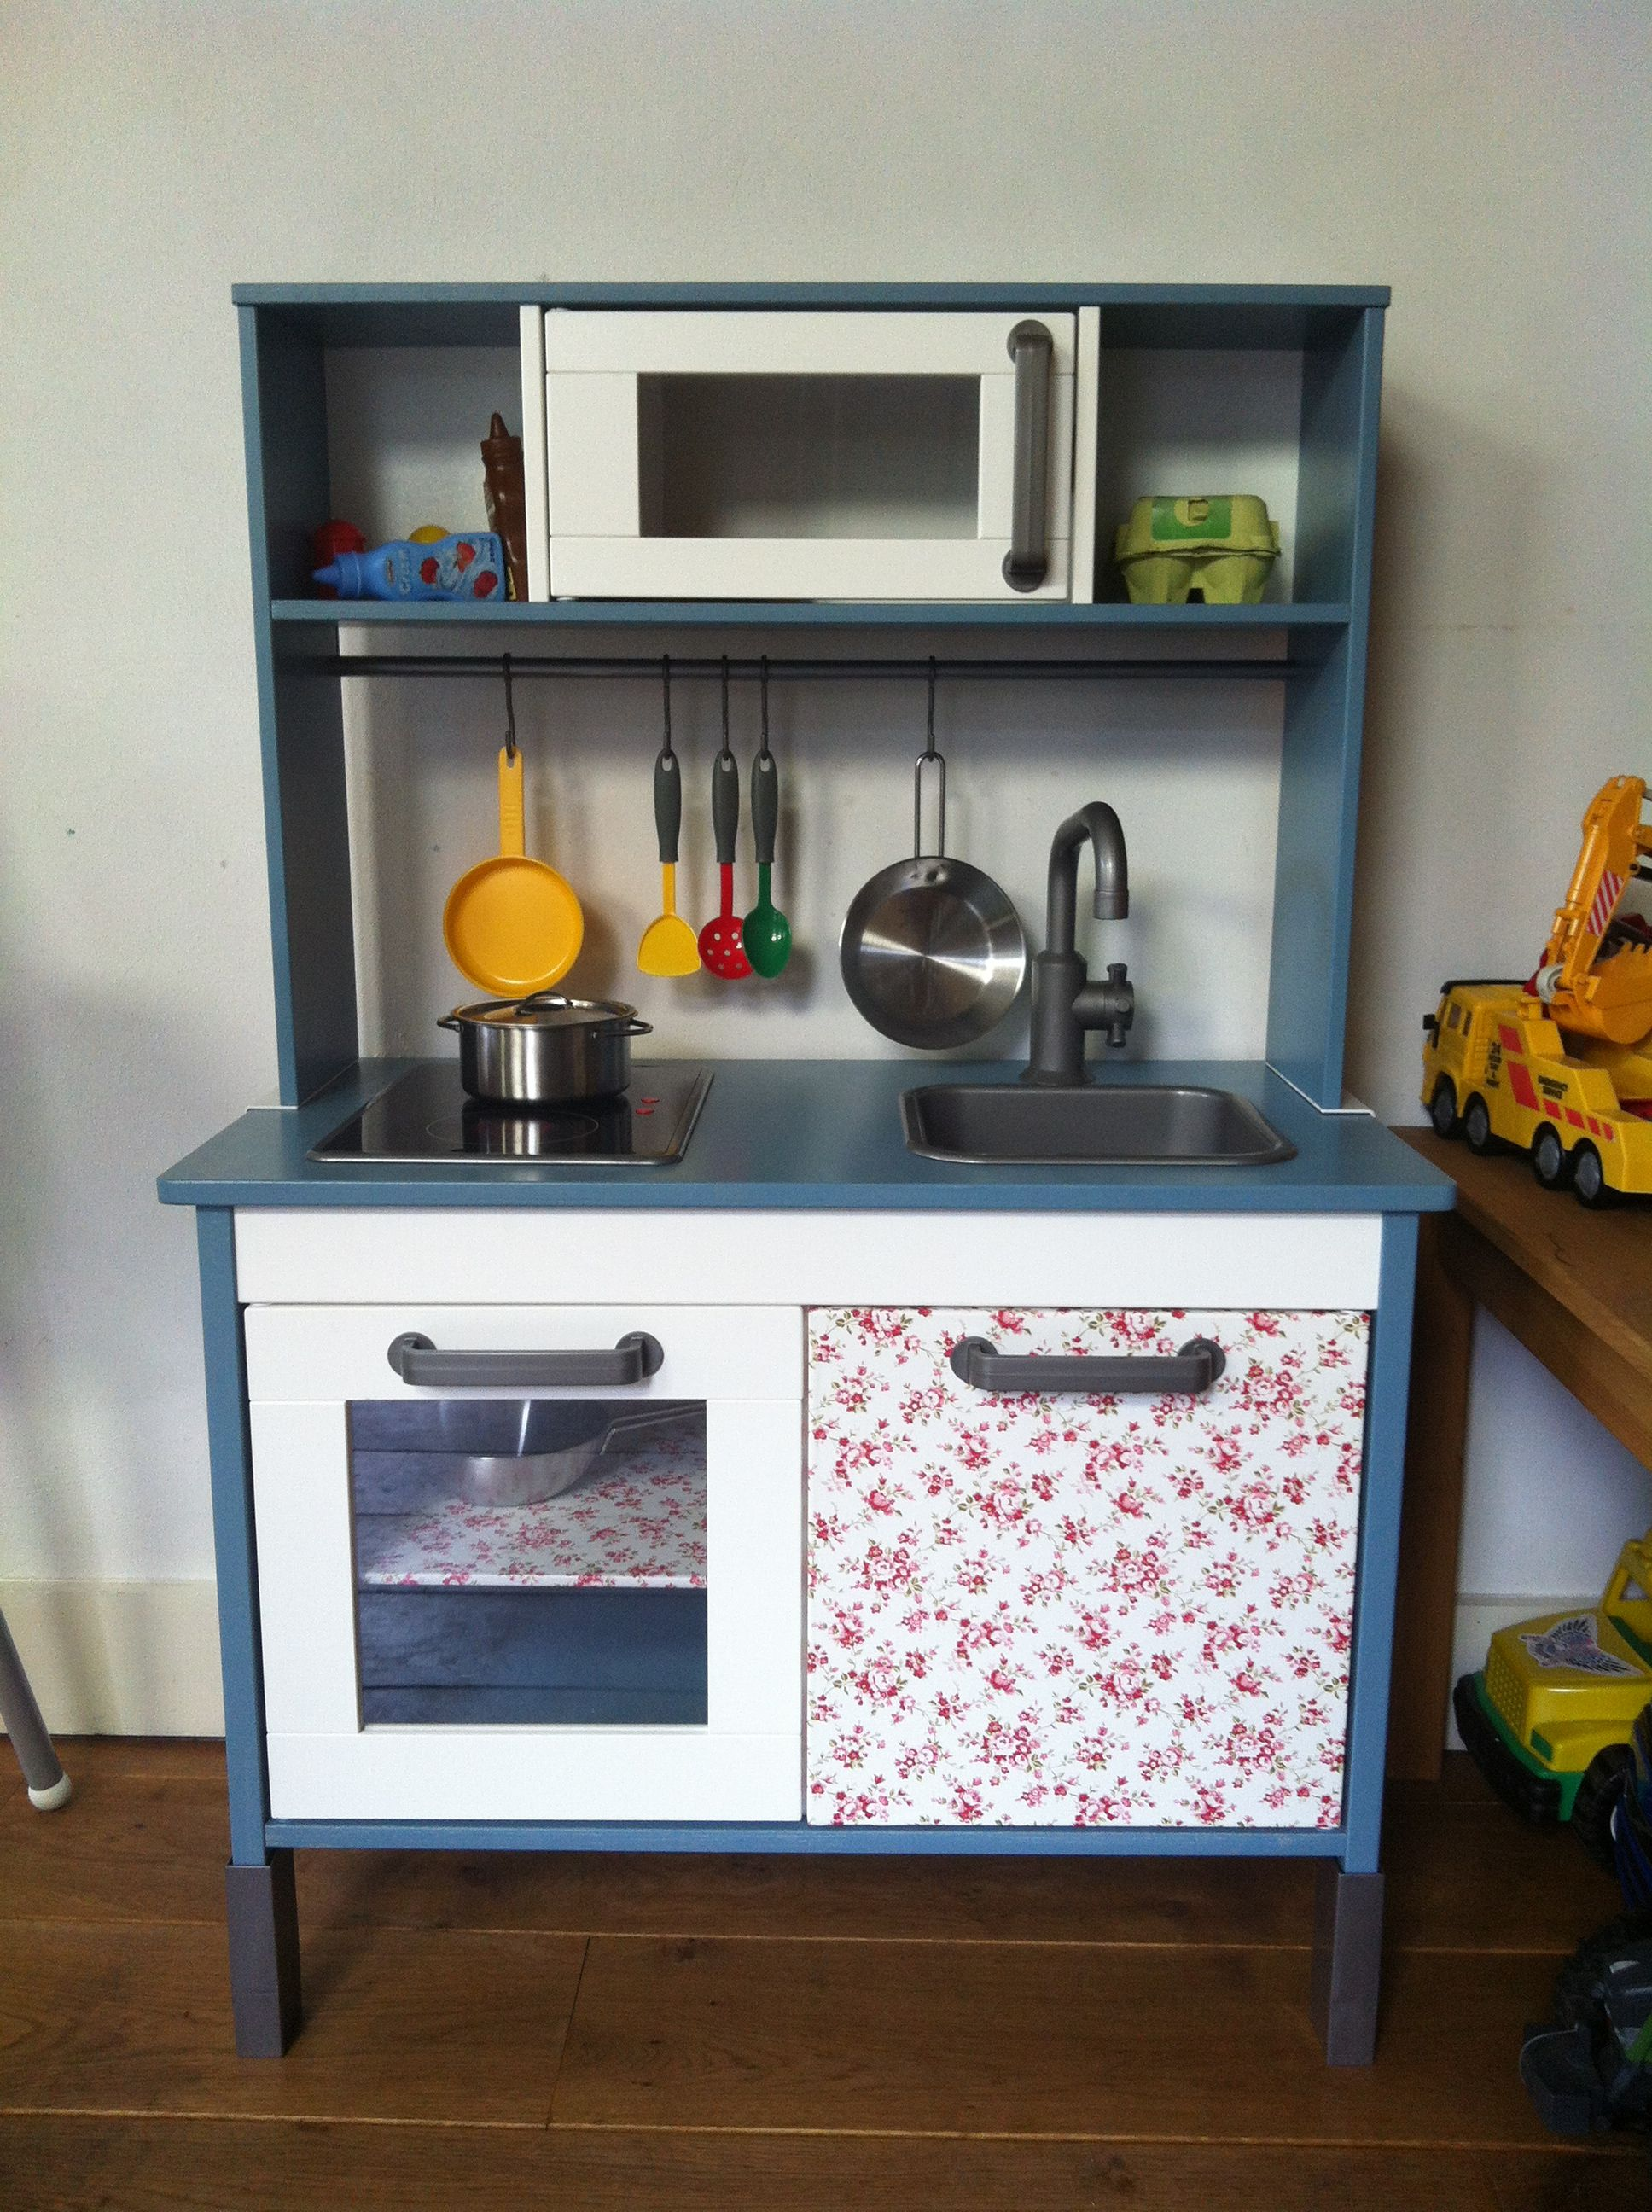 pimp ikea keuken kluswerkjes pinterest. Black Bedroom Furniture Sets. Home Design Ideas